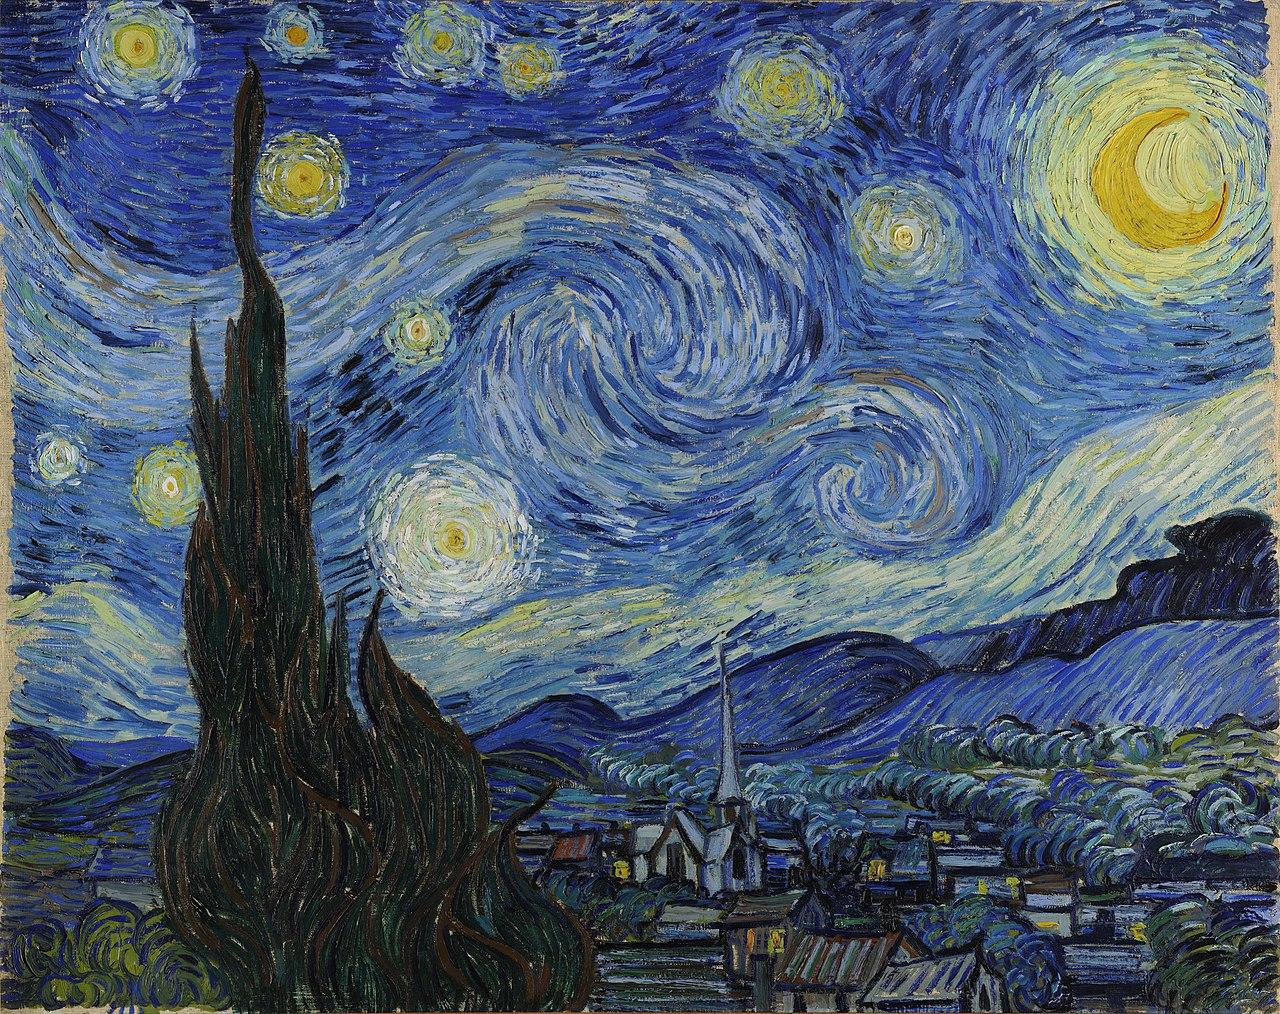 Vincent van Gogh, The Starry Night, 1889, Museum of Modern Art, New York City